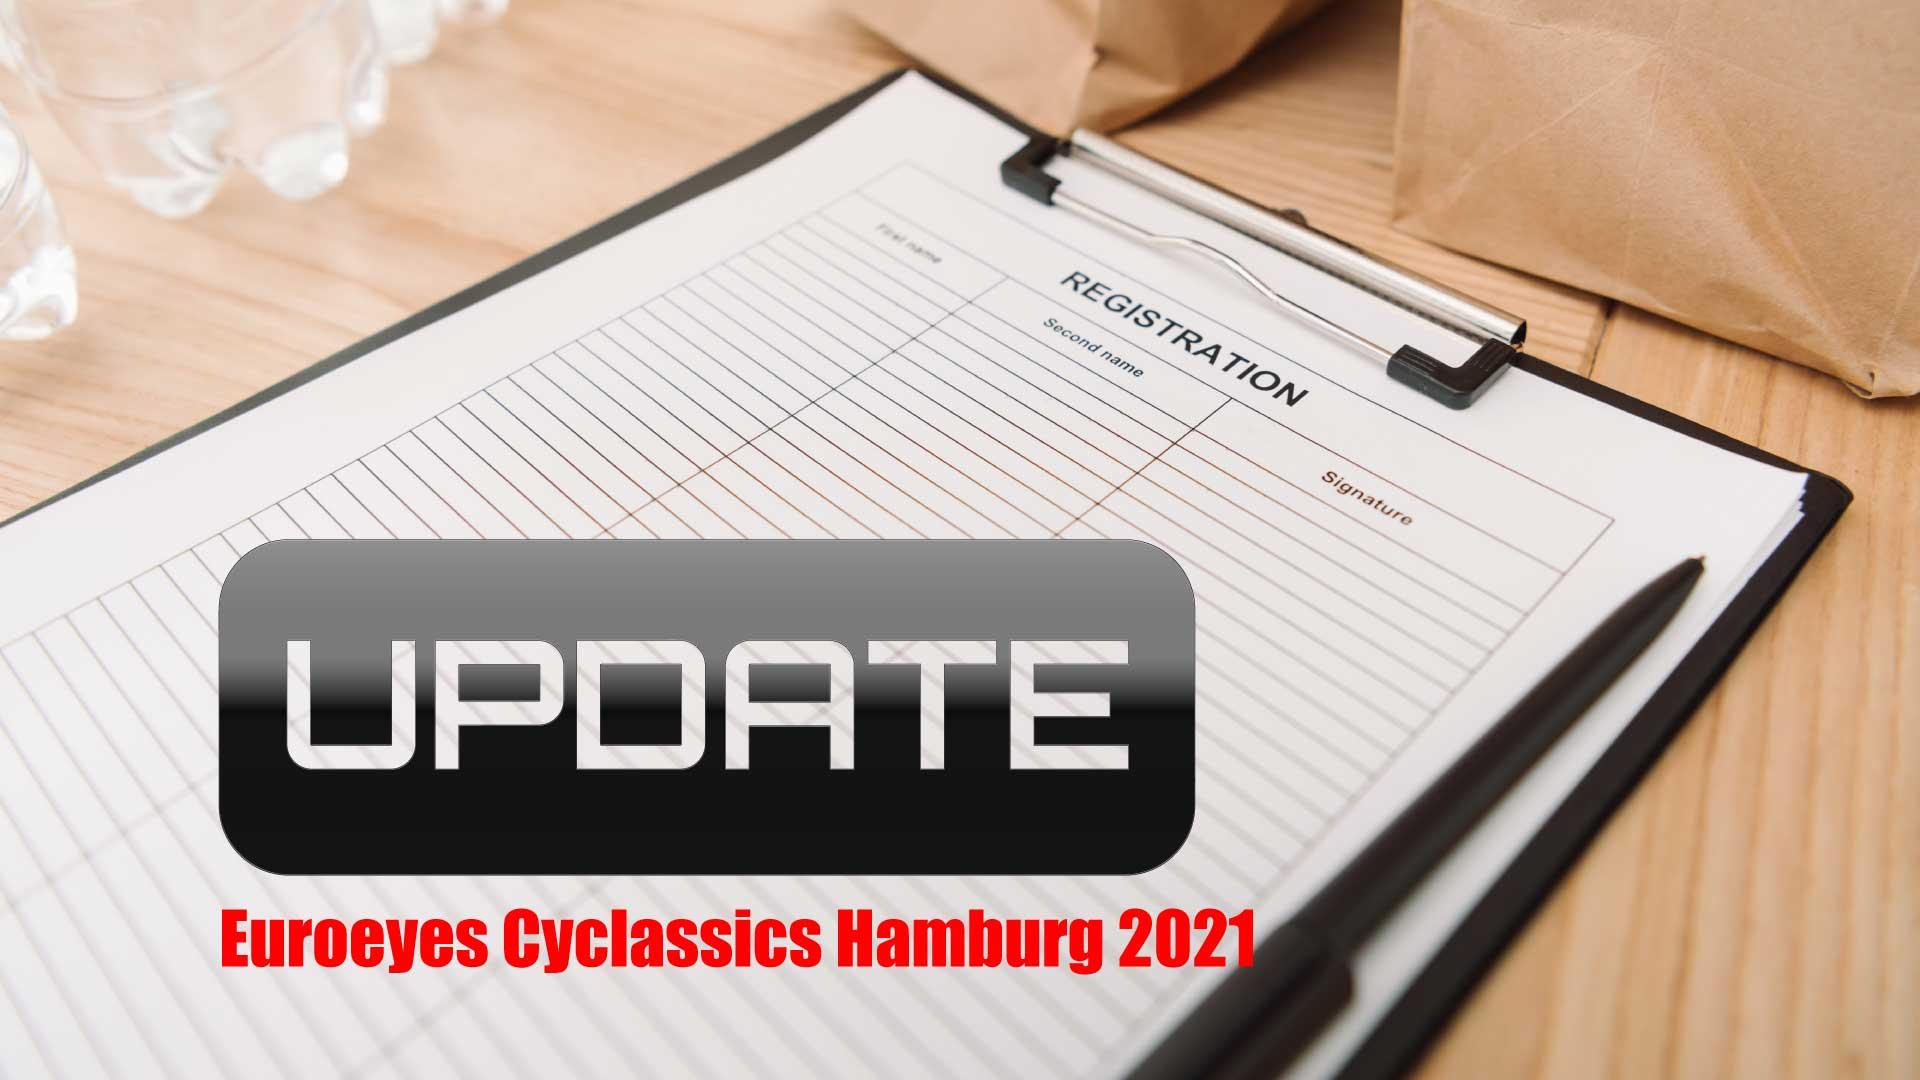 Anmeldelisten für Euroeyes Cyclassics Hamburg 2021